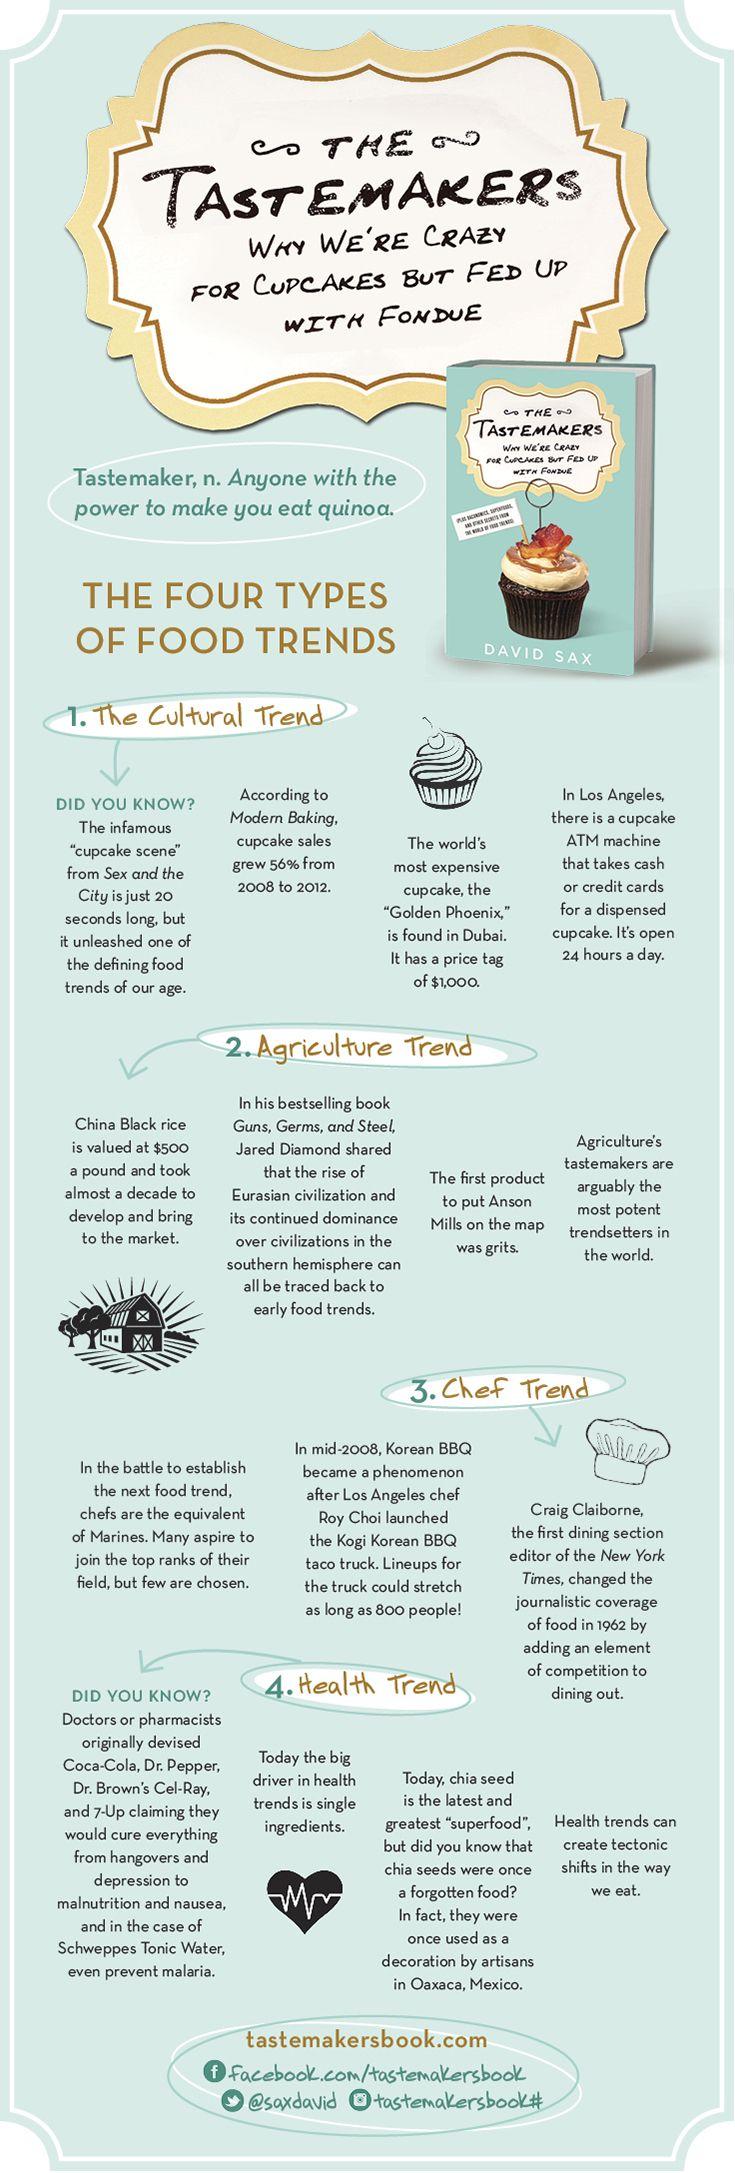 Best 25+ Foodservice Trends images on Pinterest | Diners, Restaurant ...